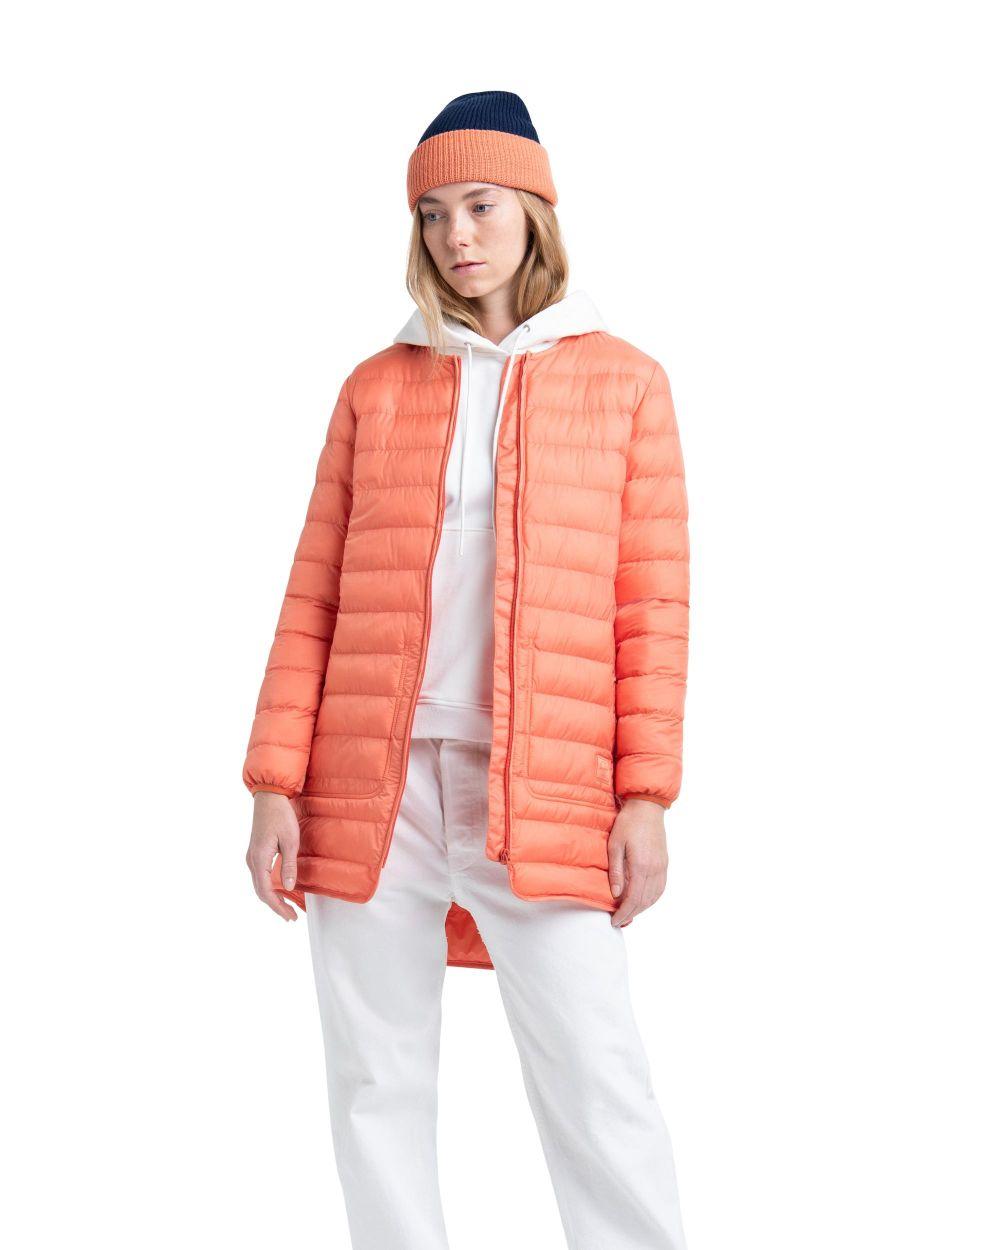 Herschel Insulated Jacket